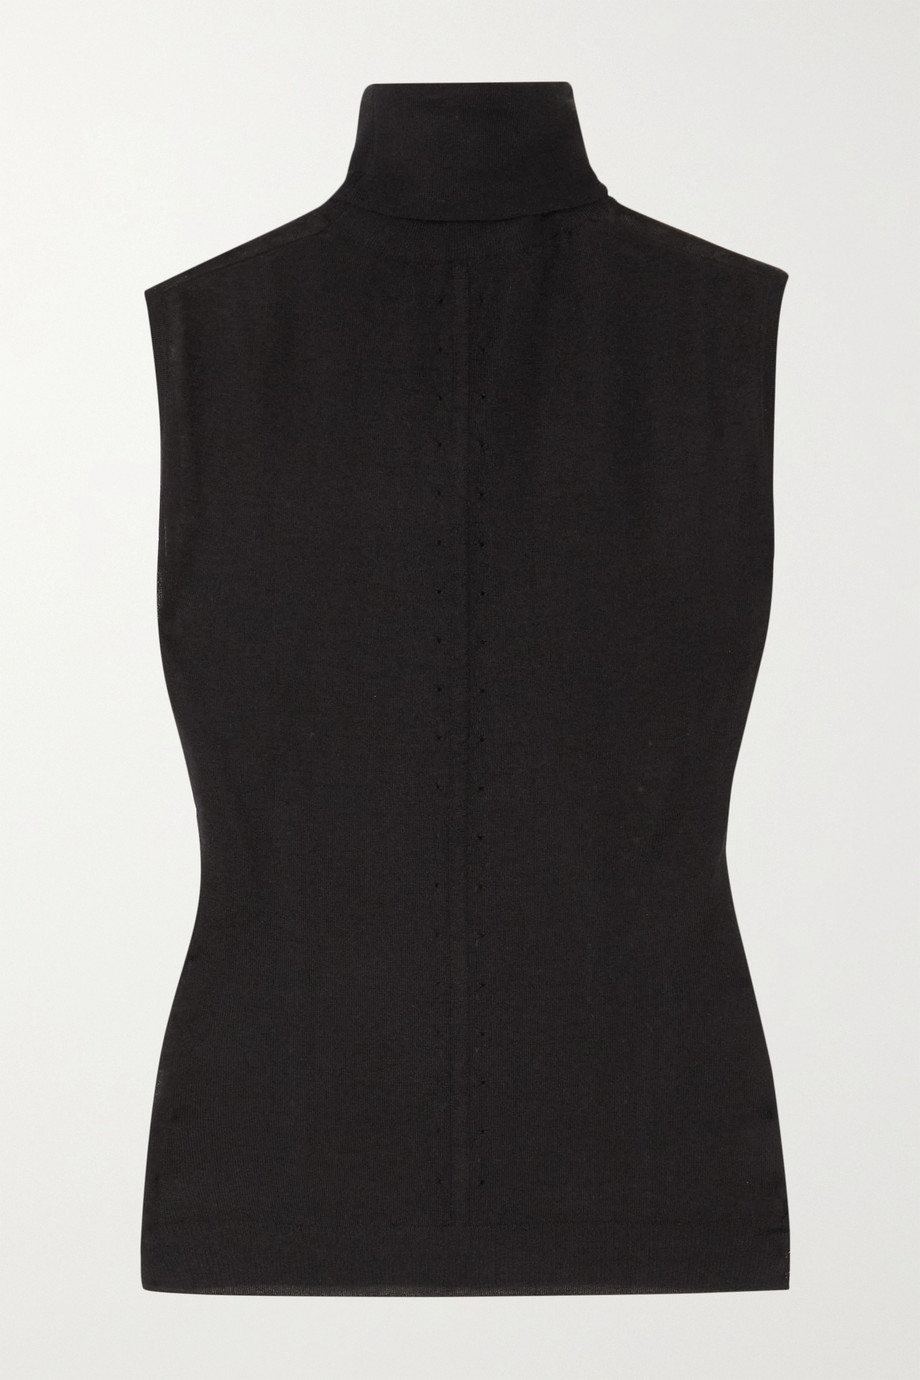 Alaïa Cashmere-blend turtleneck top